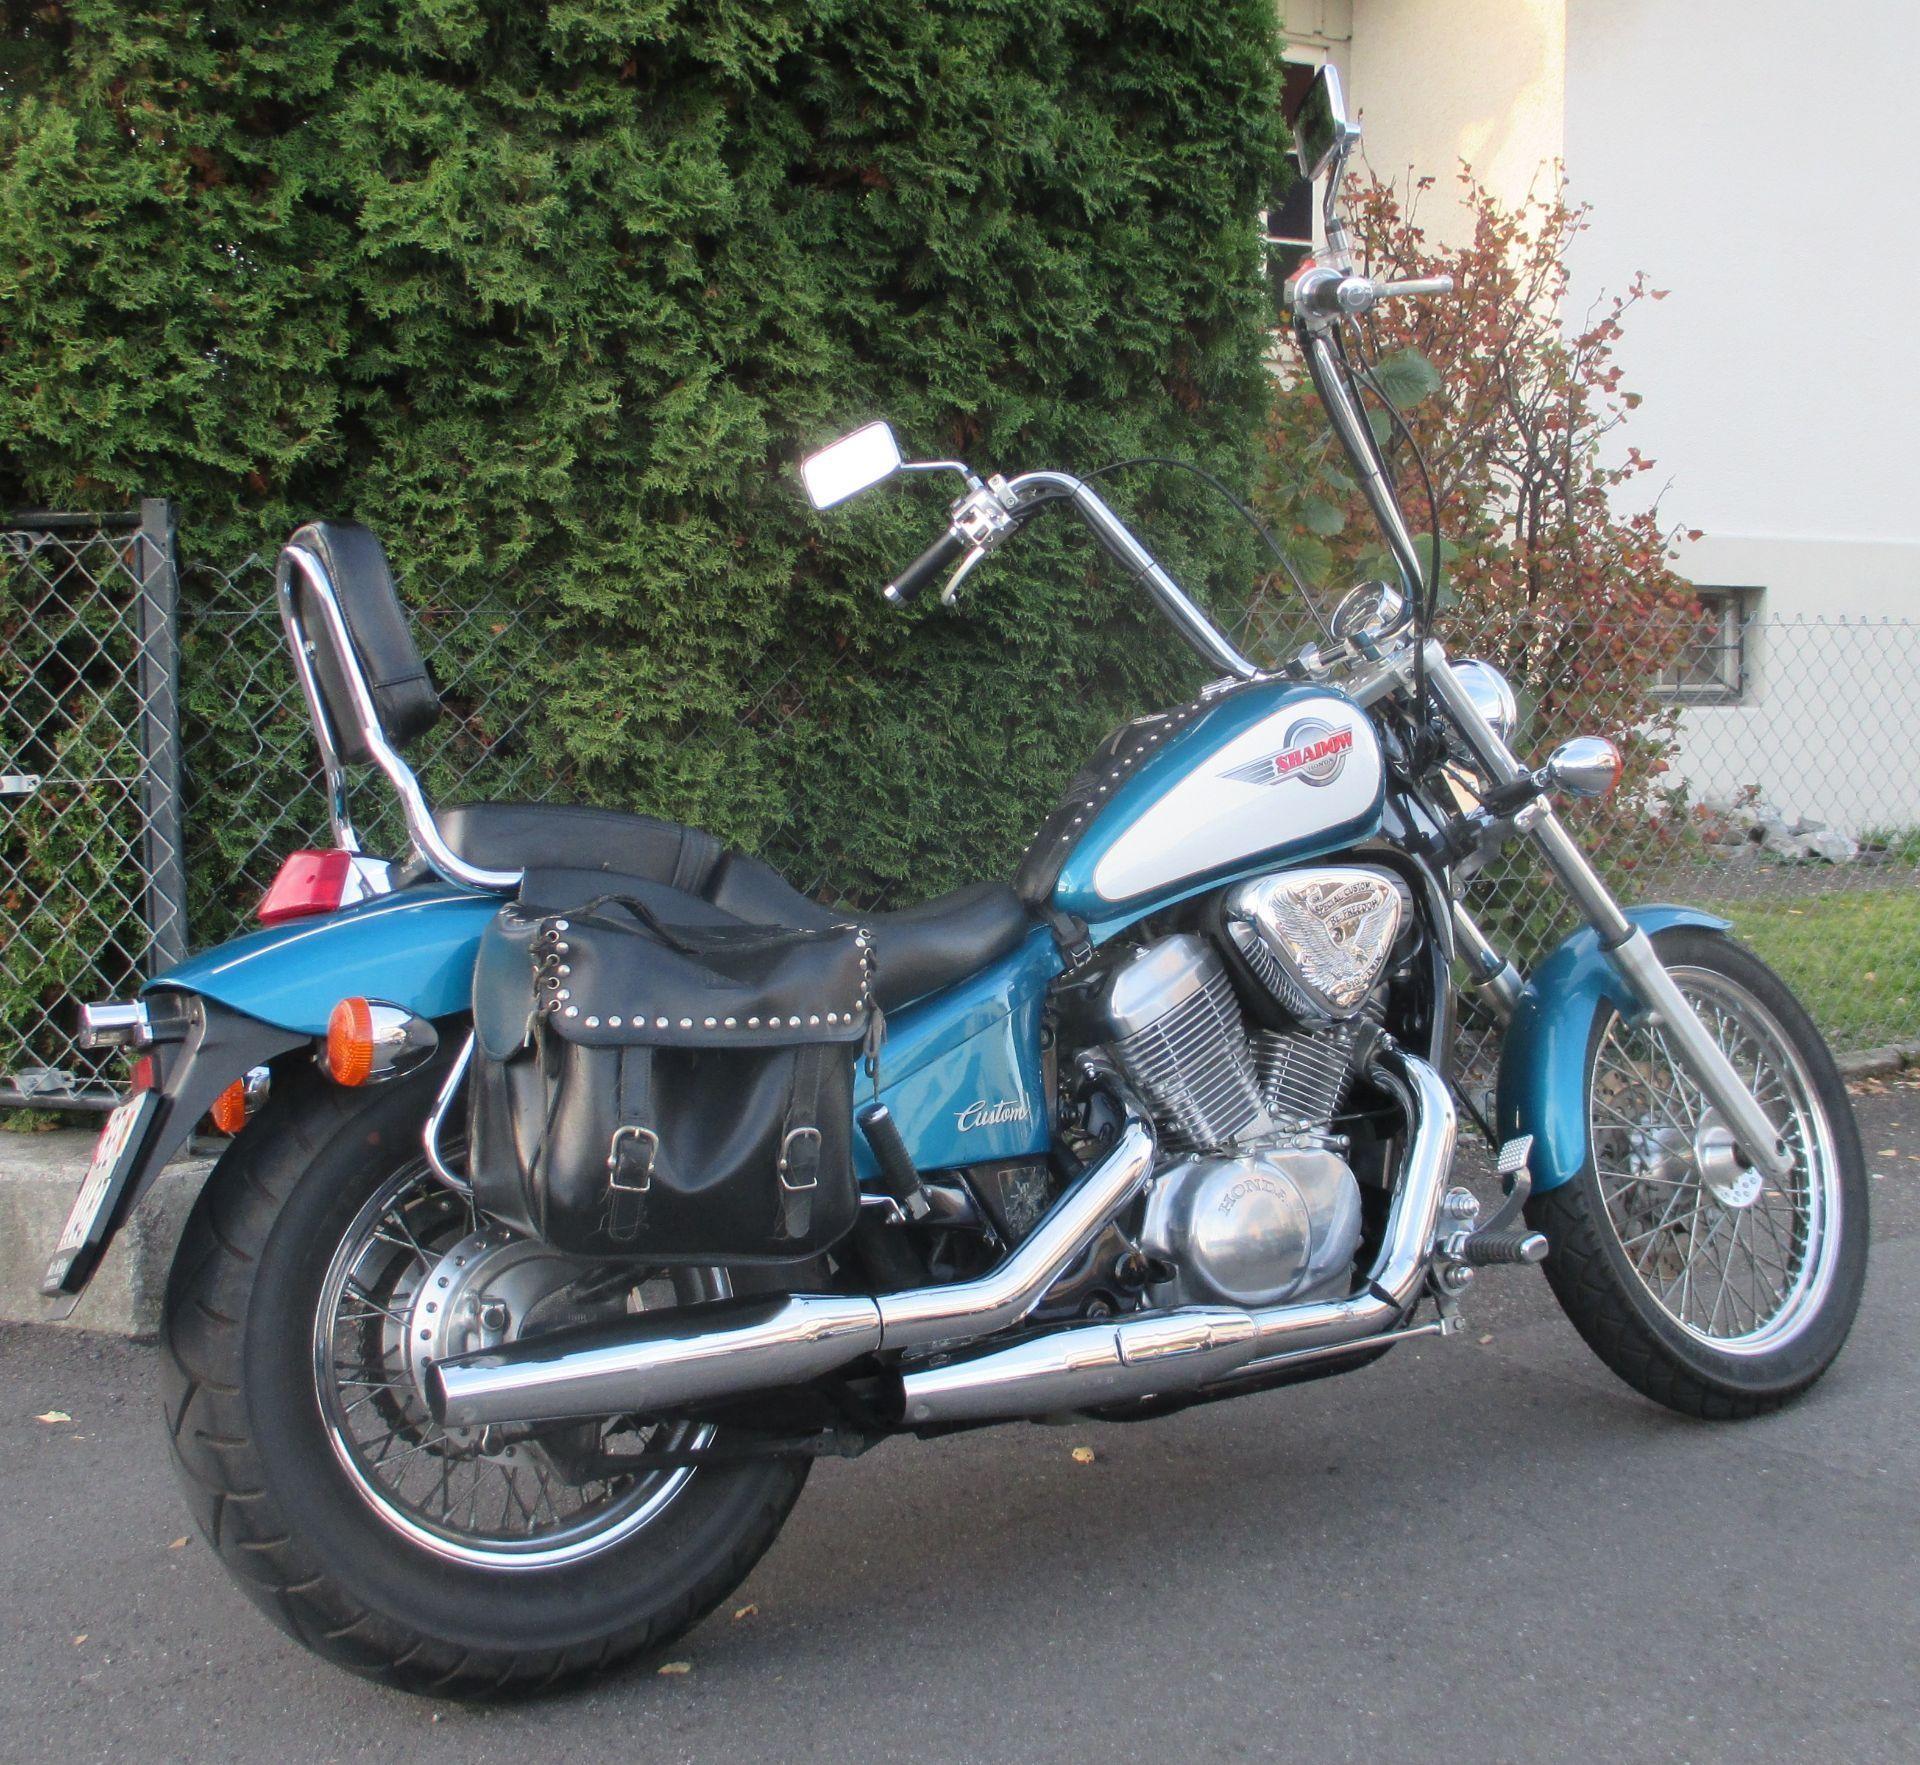 motorrad occasion kaufen honda vt 600 c shadow bikes 2. Black Bedroom Furniture Sets. Home Design Ideas